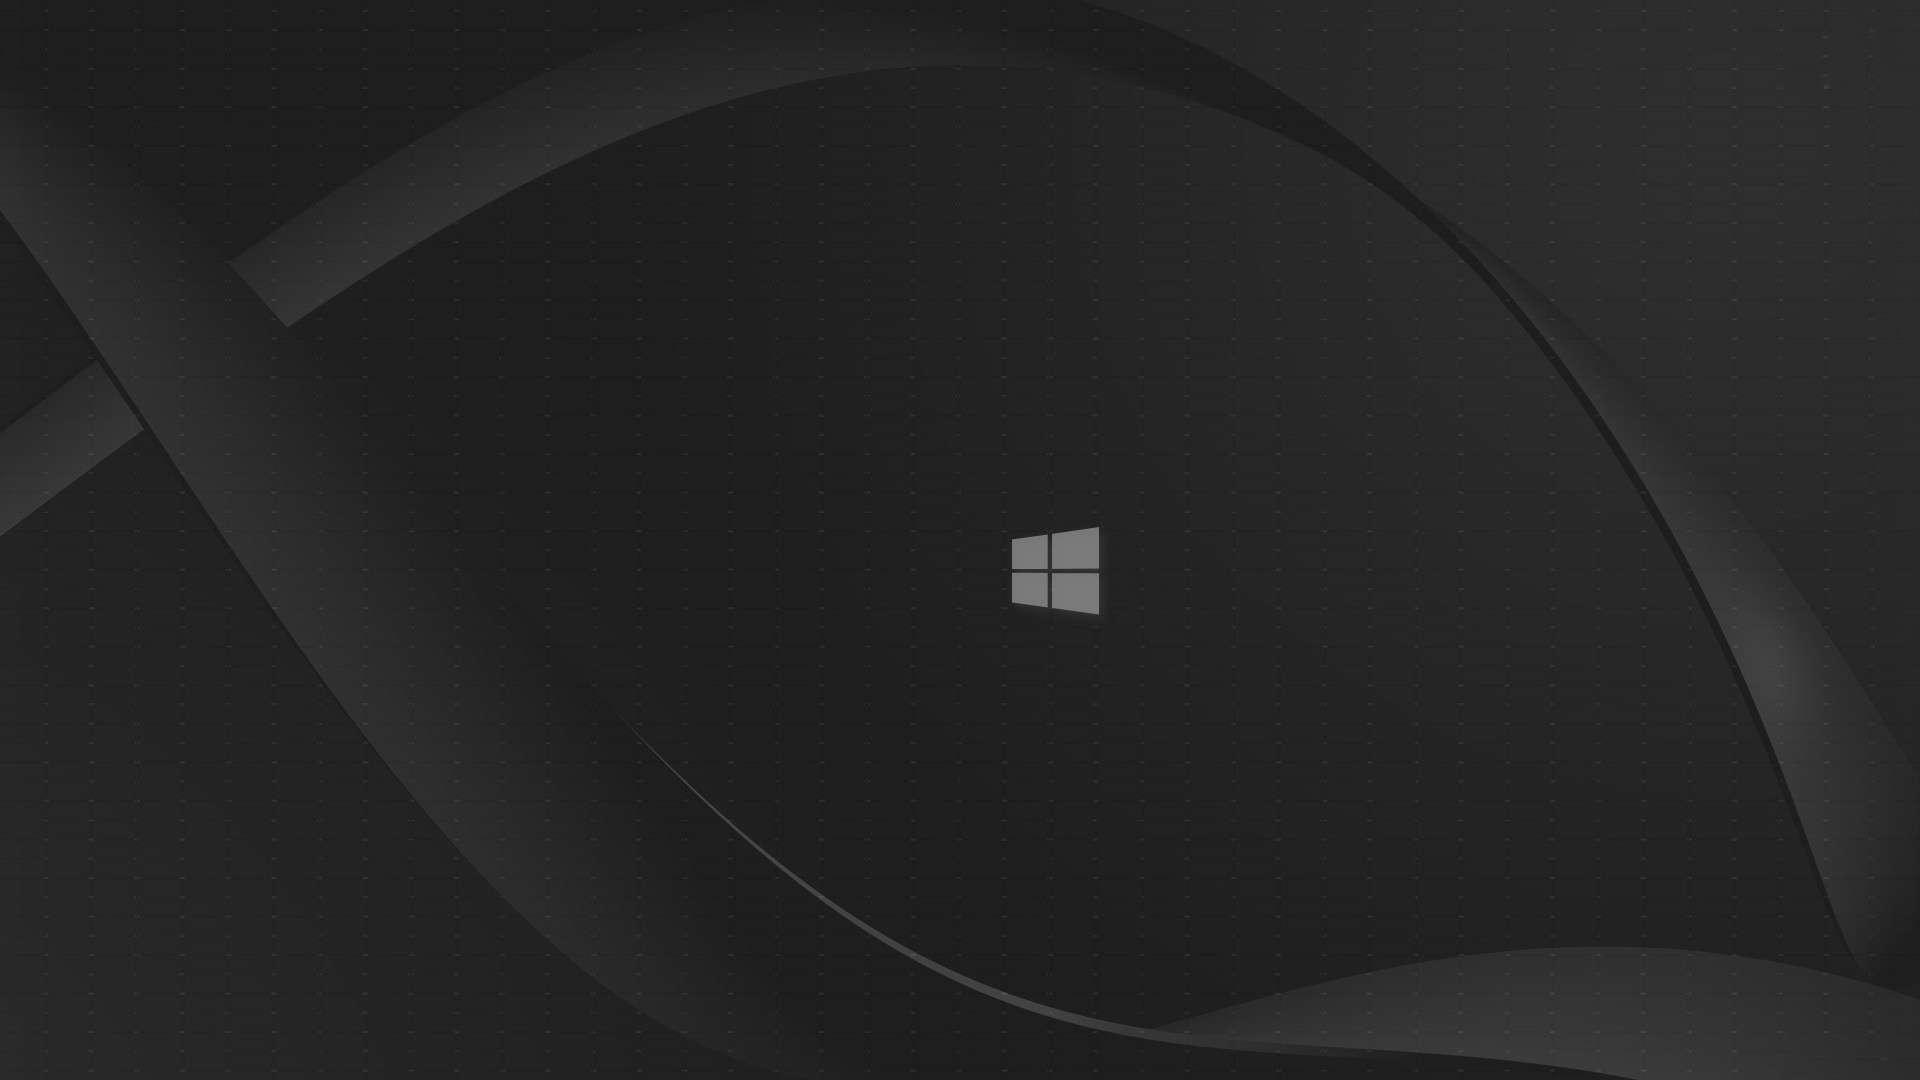 Windows 10 hd wallpapers 1080p wallpapersafari - Windows 10 wallpaper hd 1080p ...